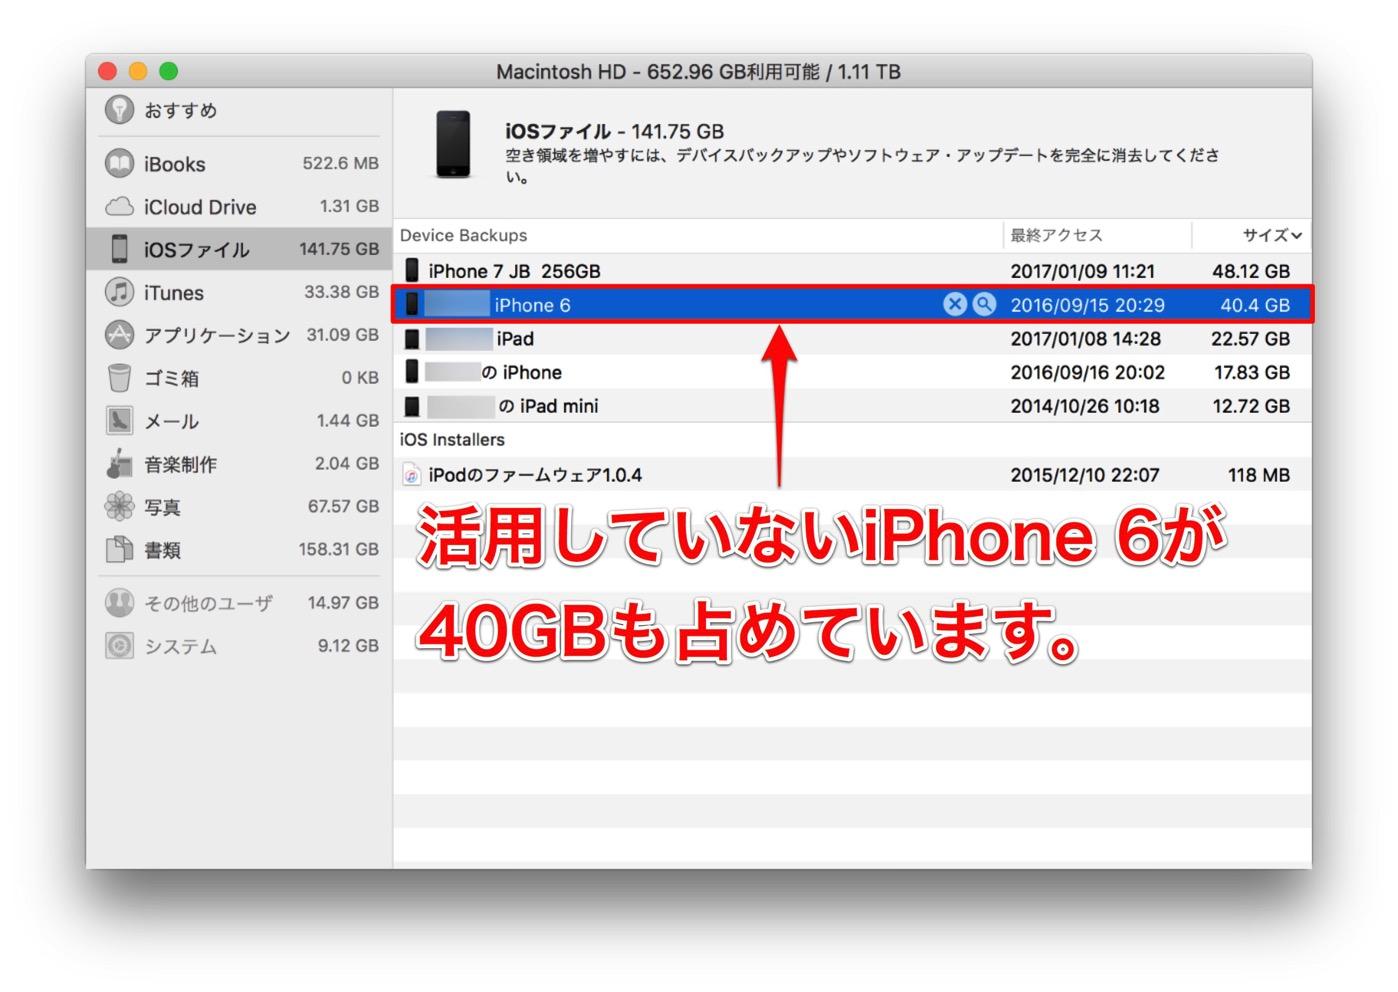 iMac 5K Retinaディスプレイモデル 管理画面-7